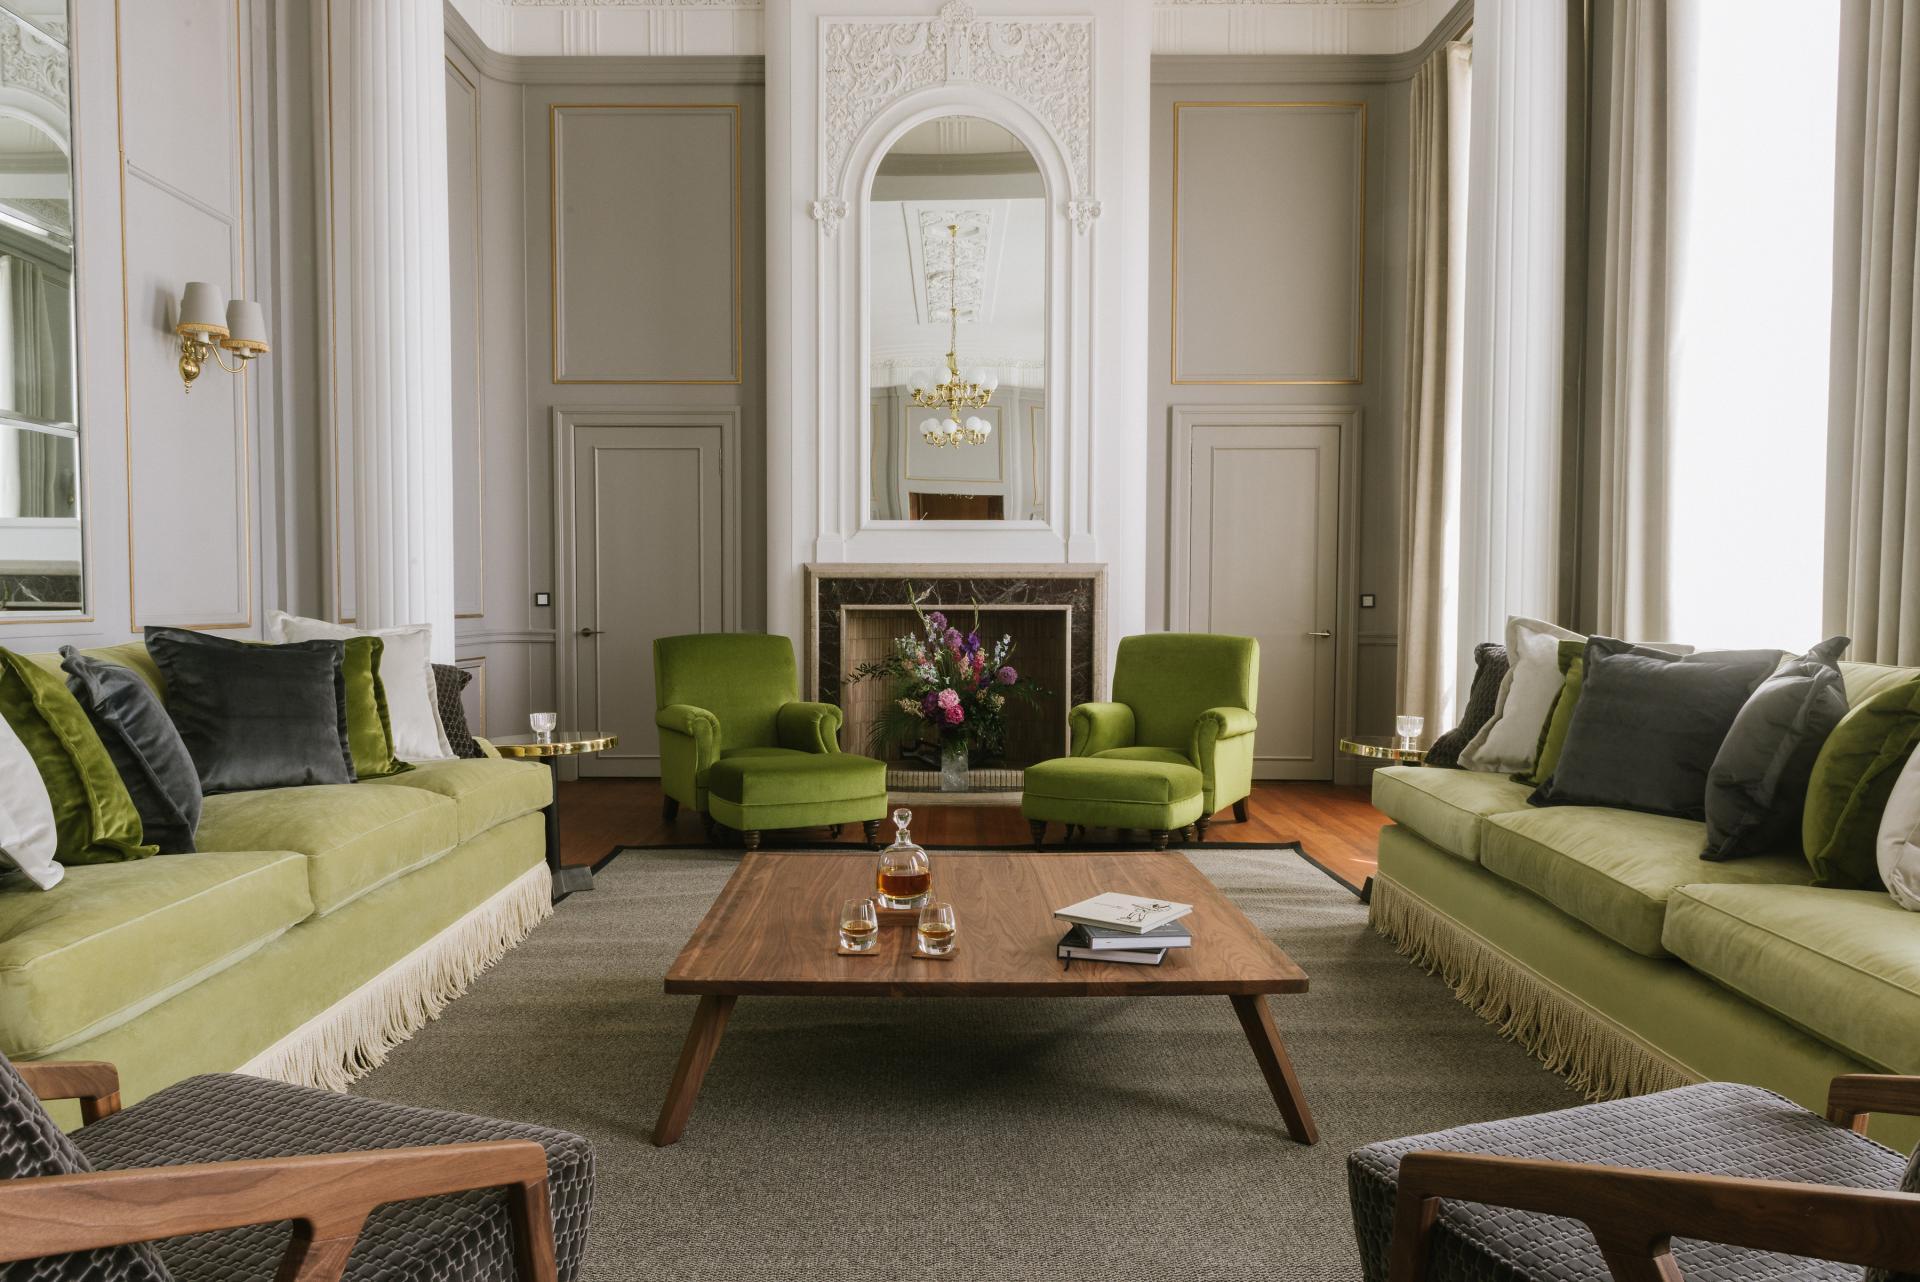 Luxury lounge at The Edinburgh Grand Apartments, Centre, Edinburgh - Citybase Apartments